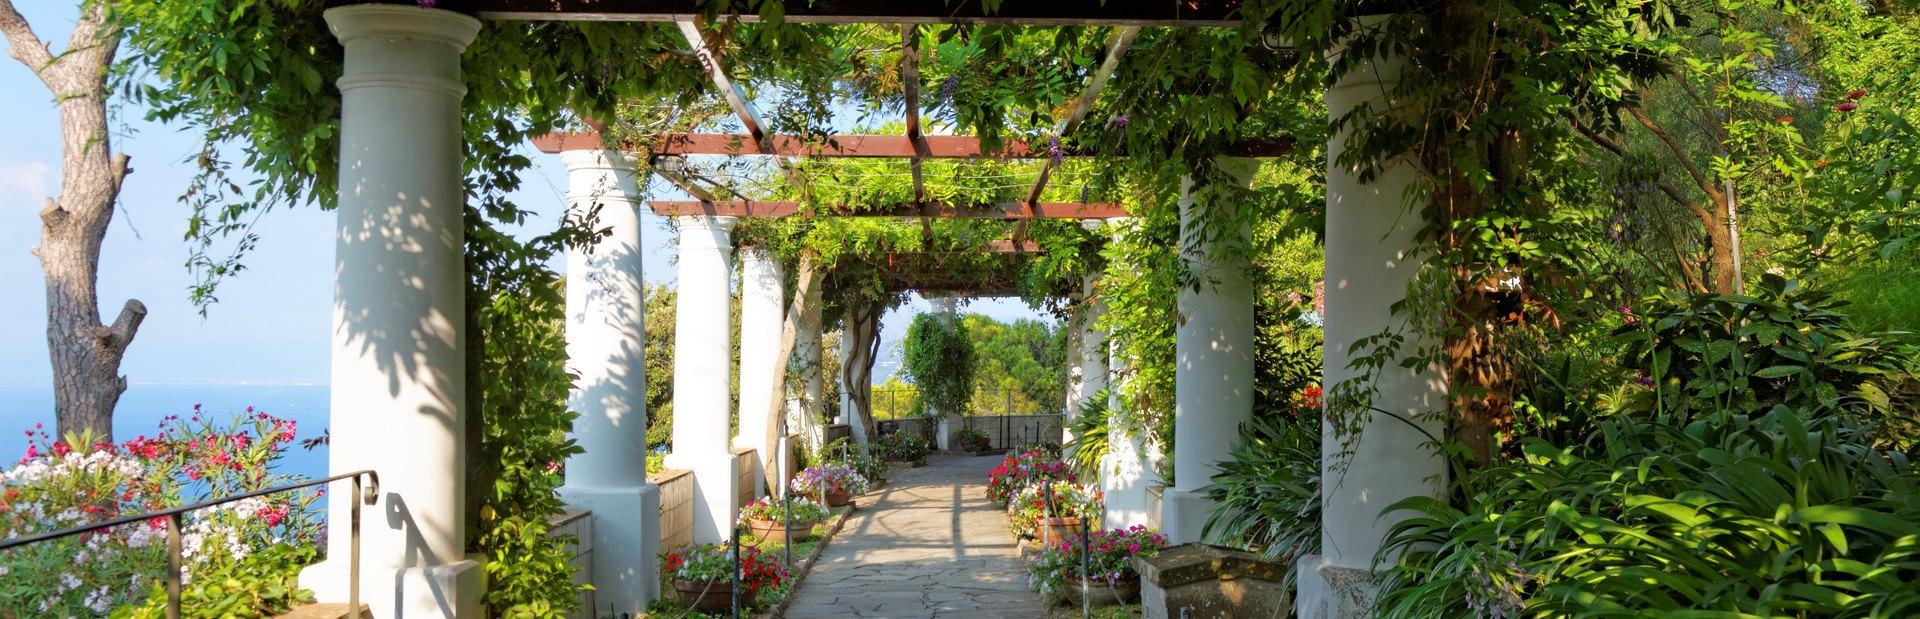 Villa San Michele Image 1